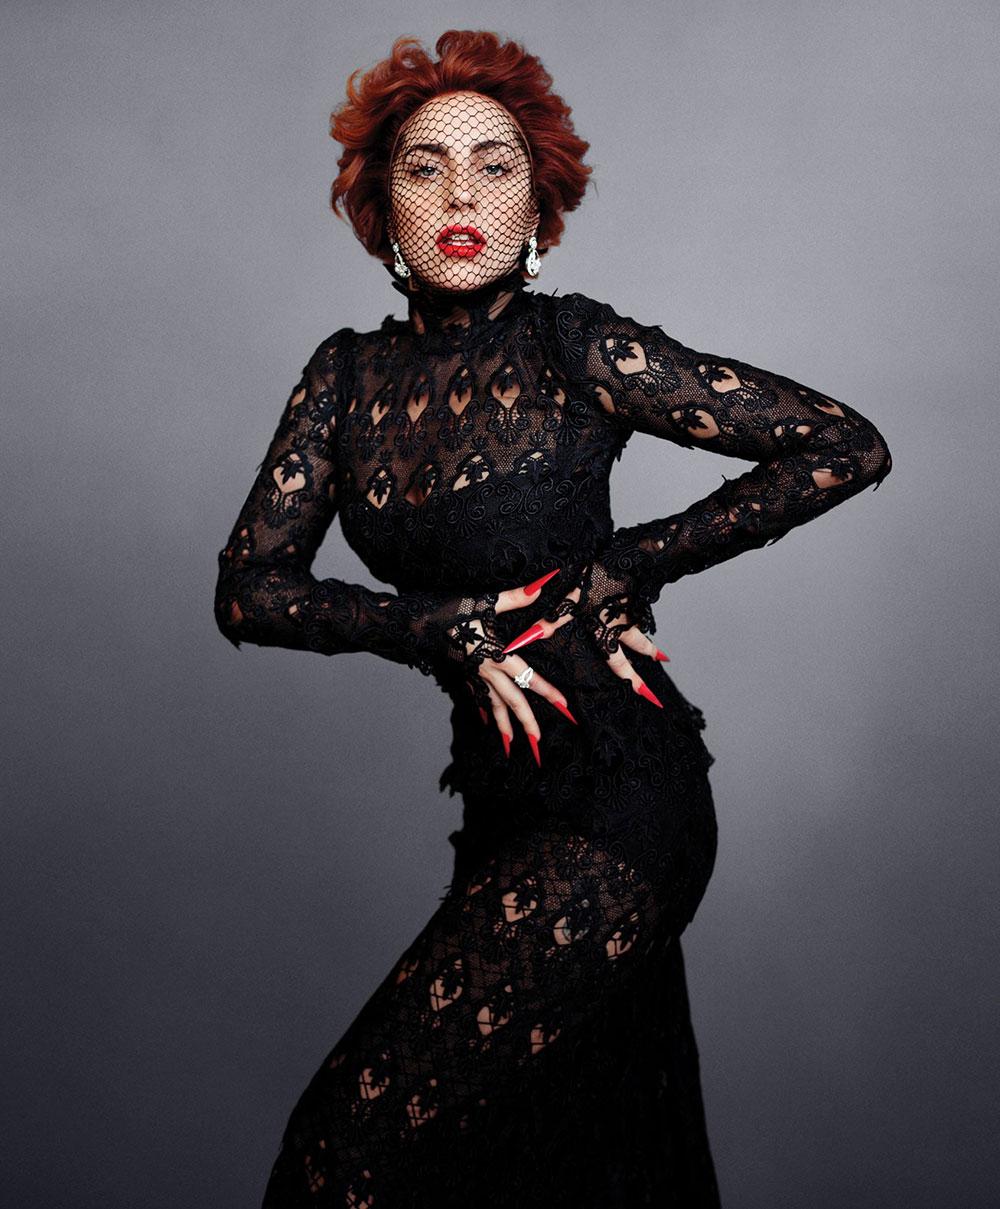 World Photography: Lady GaGa Covers Harpers Bazaar